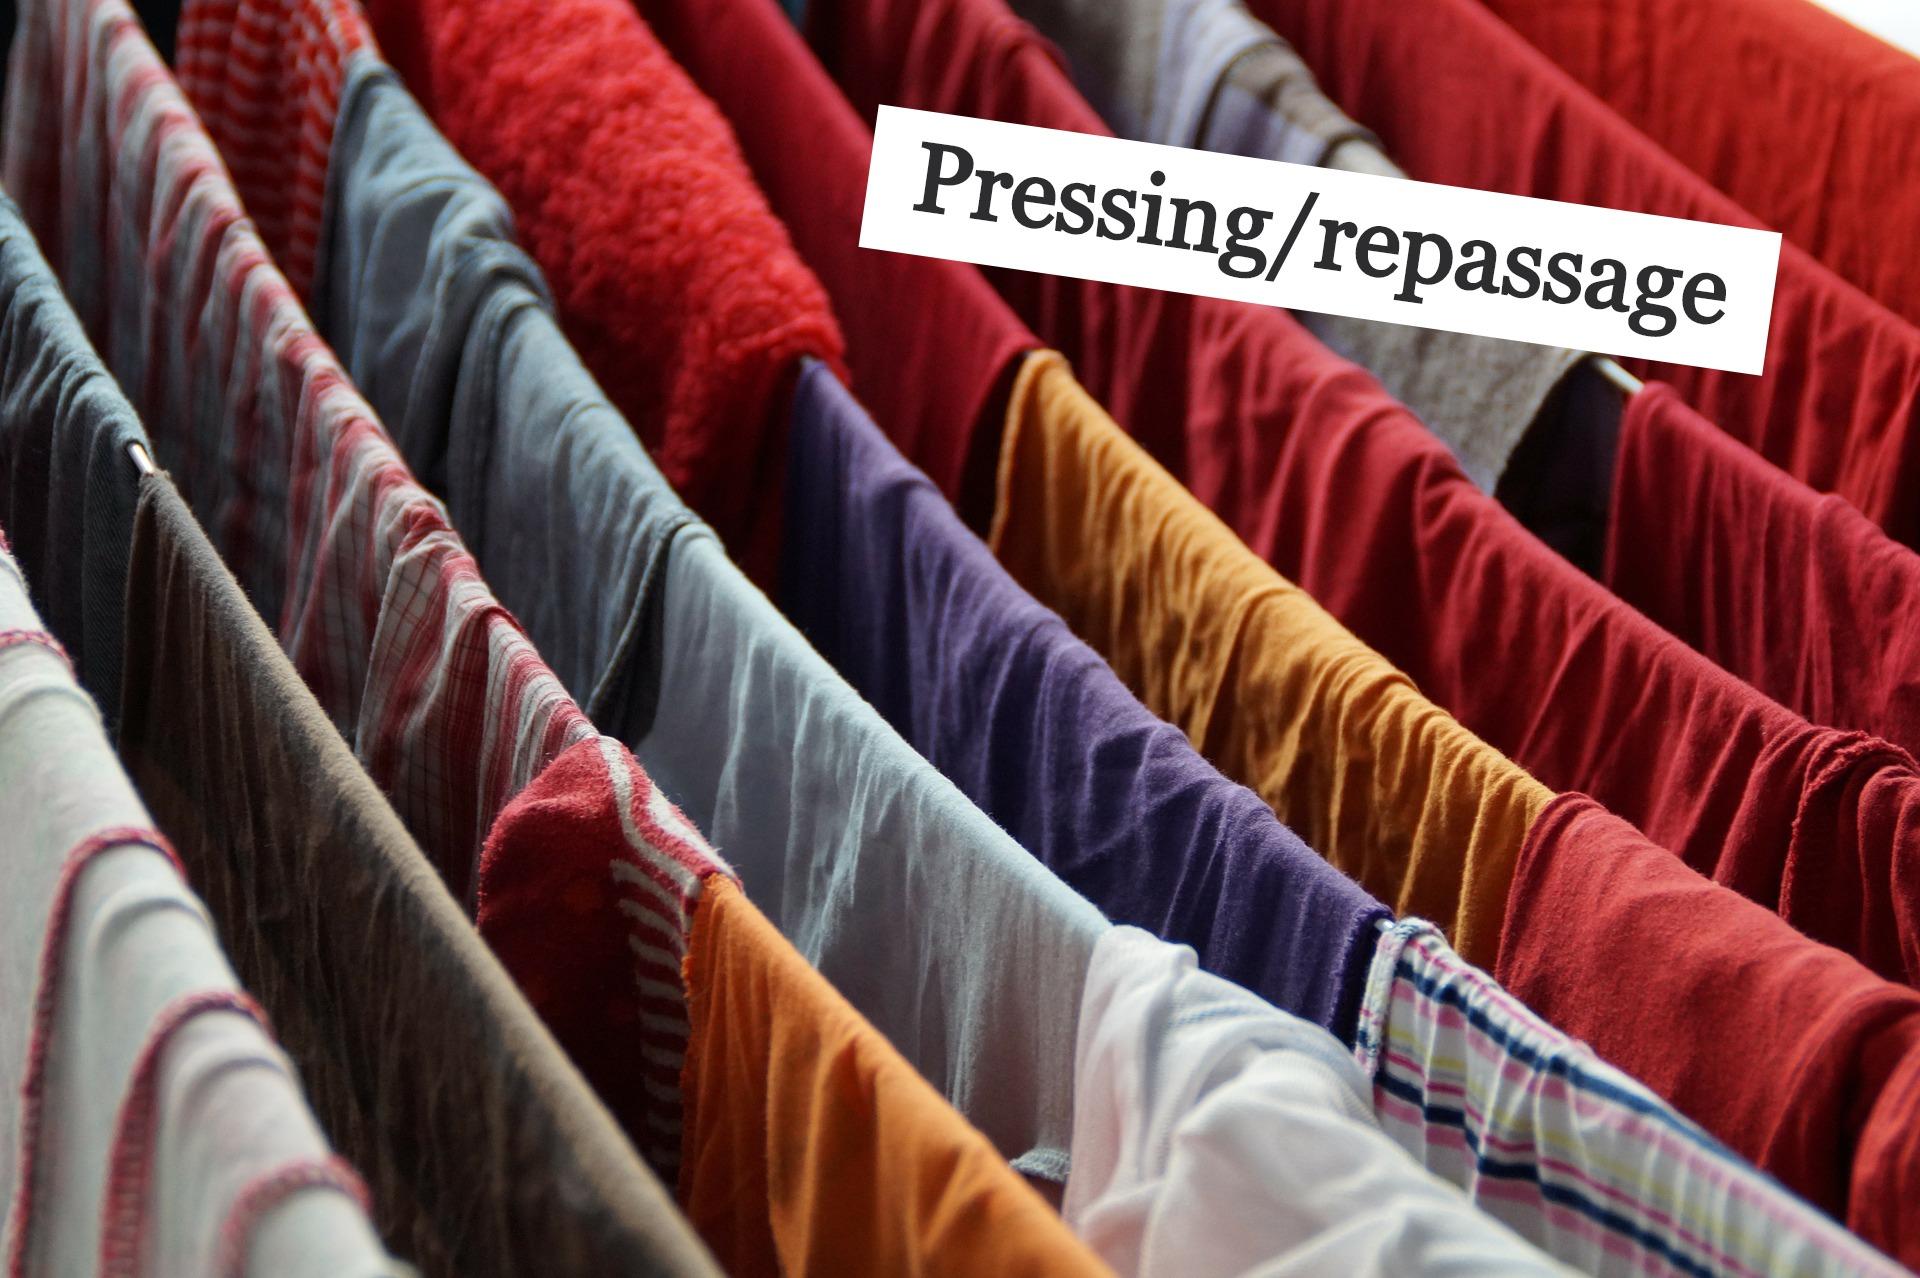 Pressing/repassage